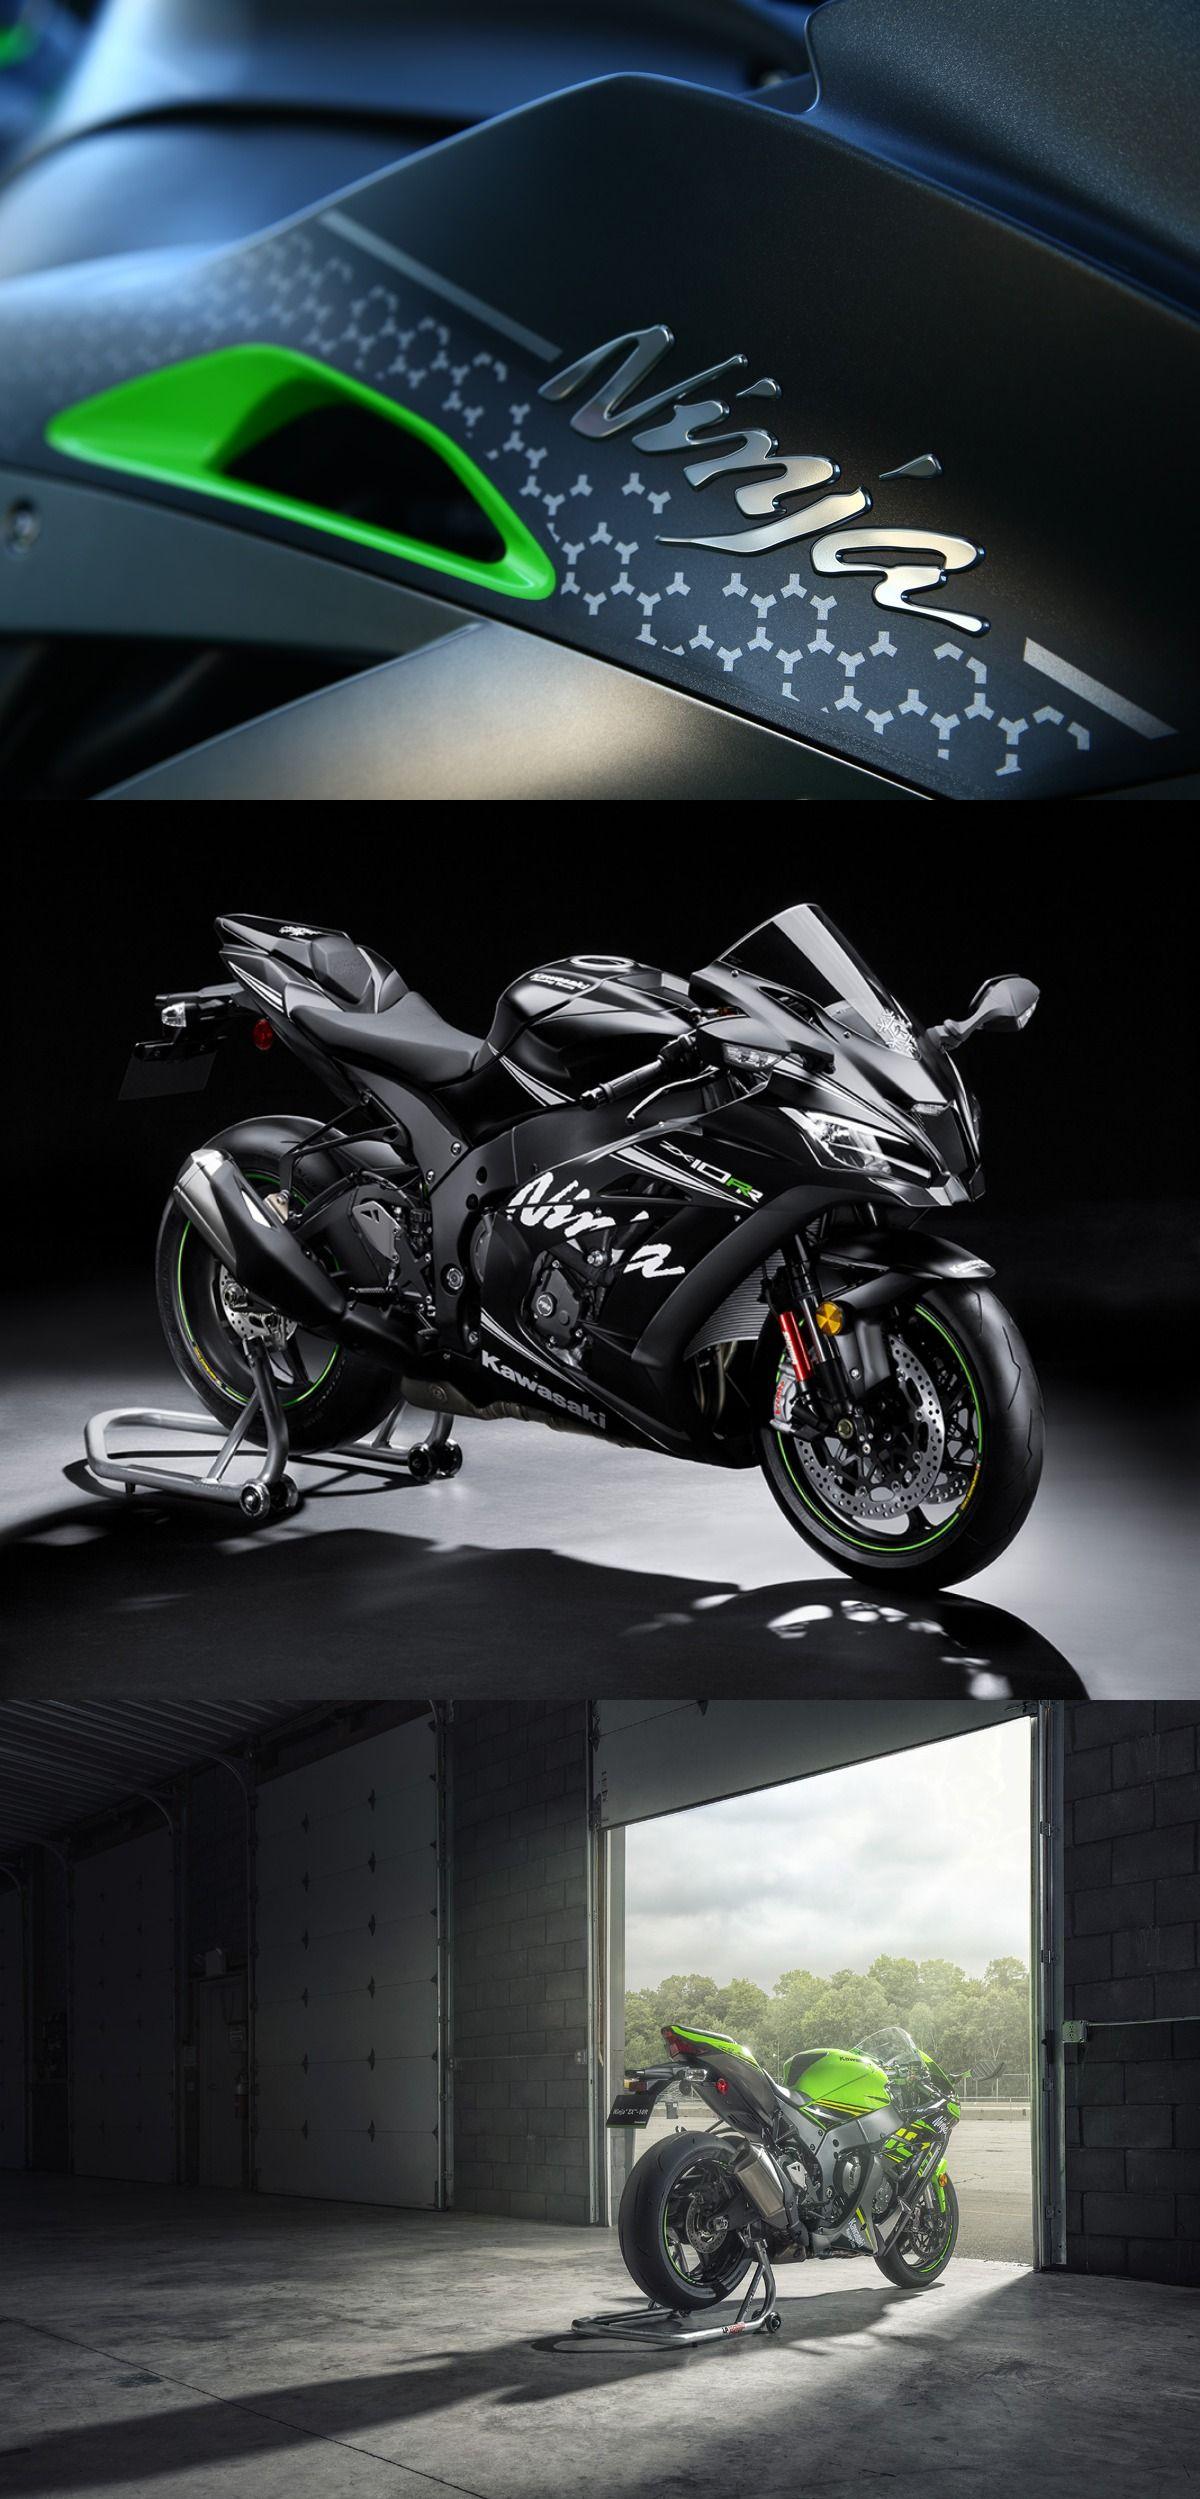 Kawasaki Ninja ZX-10R Model: Power, Mileage, Safety